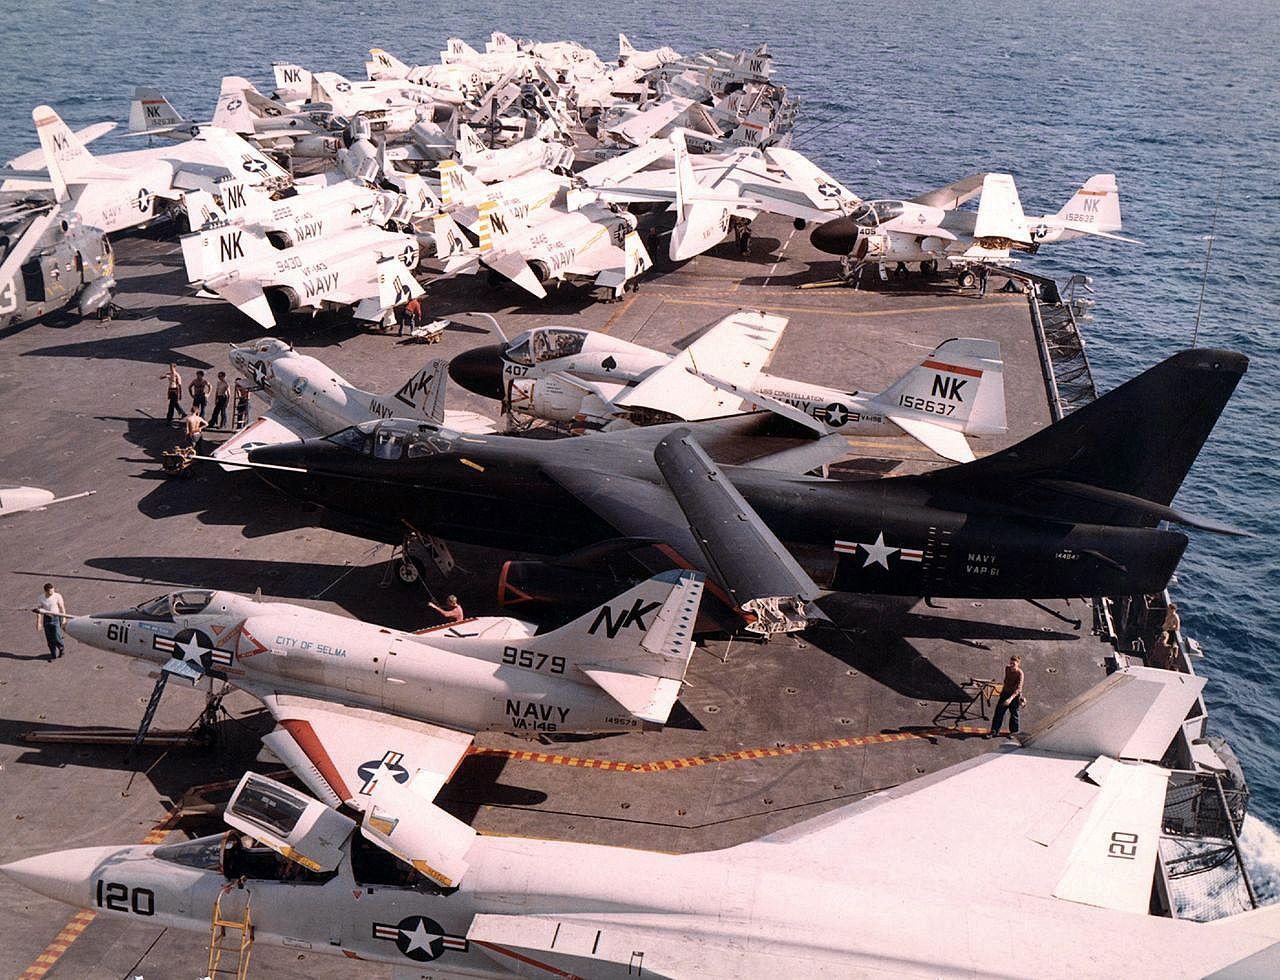 "A-1 Skyraider, A-3 Skywarrior, A-4 Skyhawk, A-5 Vigilante, A-6 Intruder, F-4 Phantom II and a lone SH-3 Seaking aboard the deck of USS Constelation, Vietnam War, 1967. """